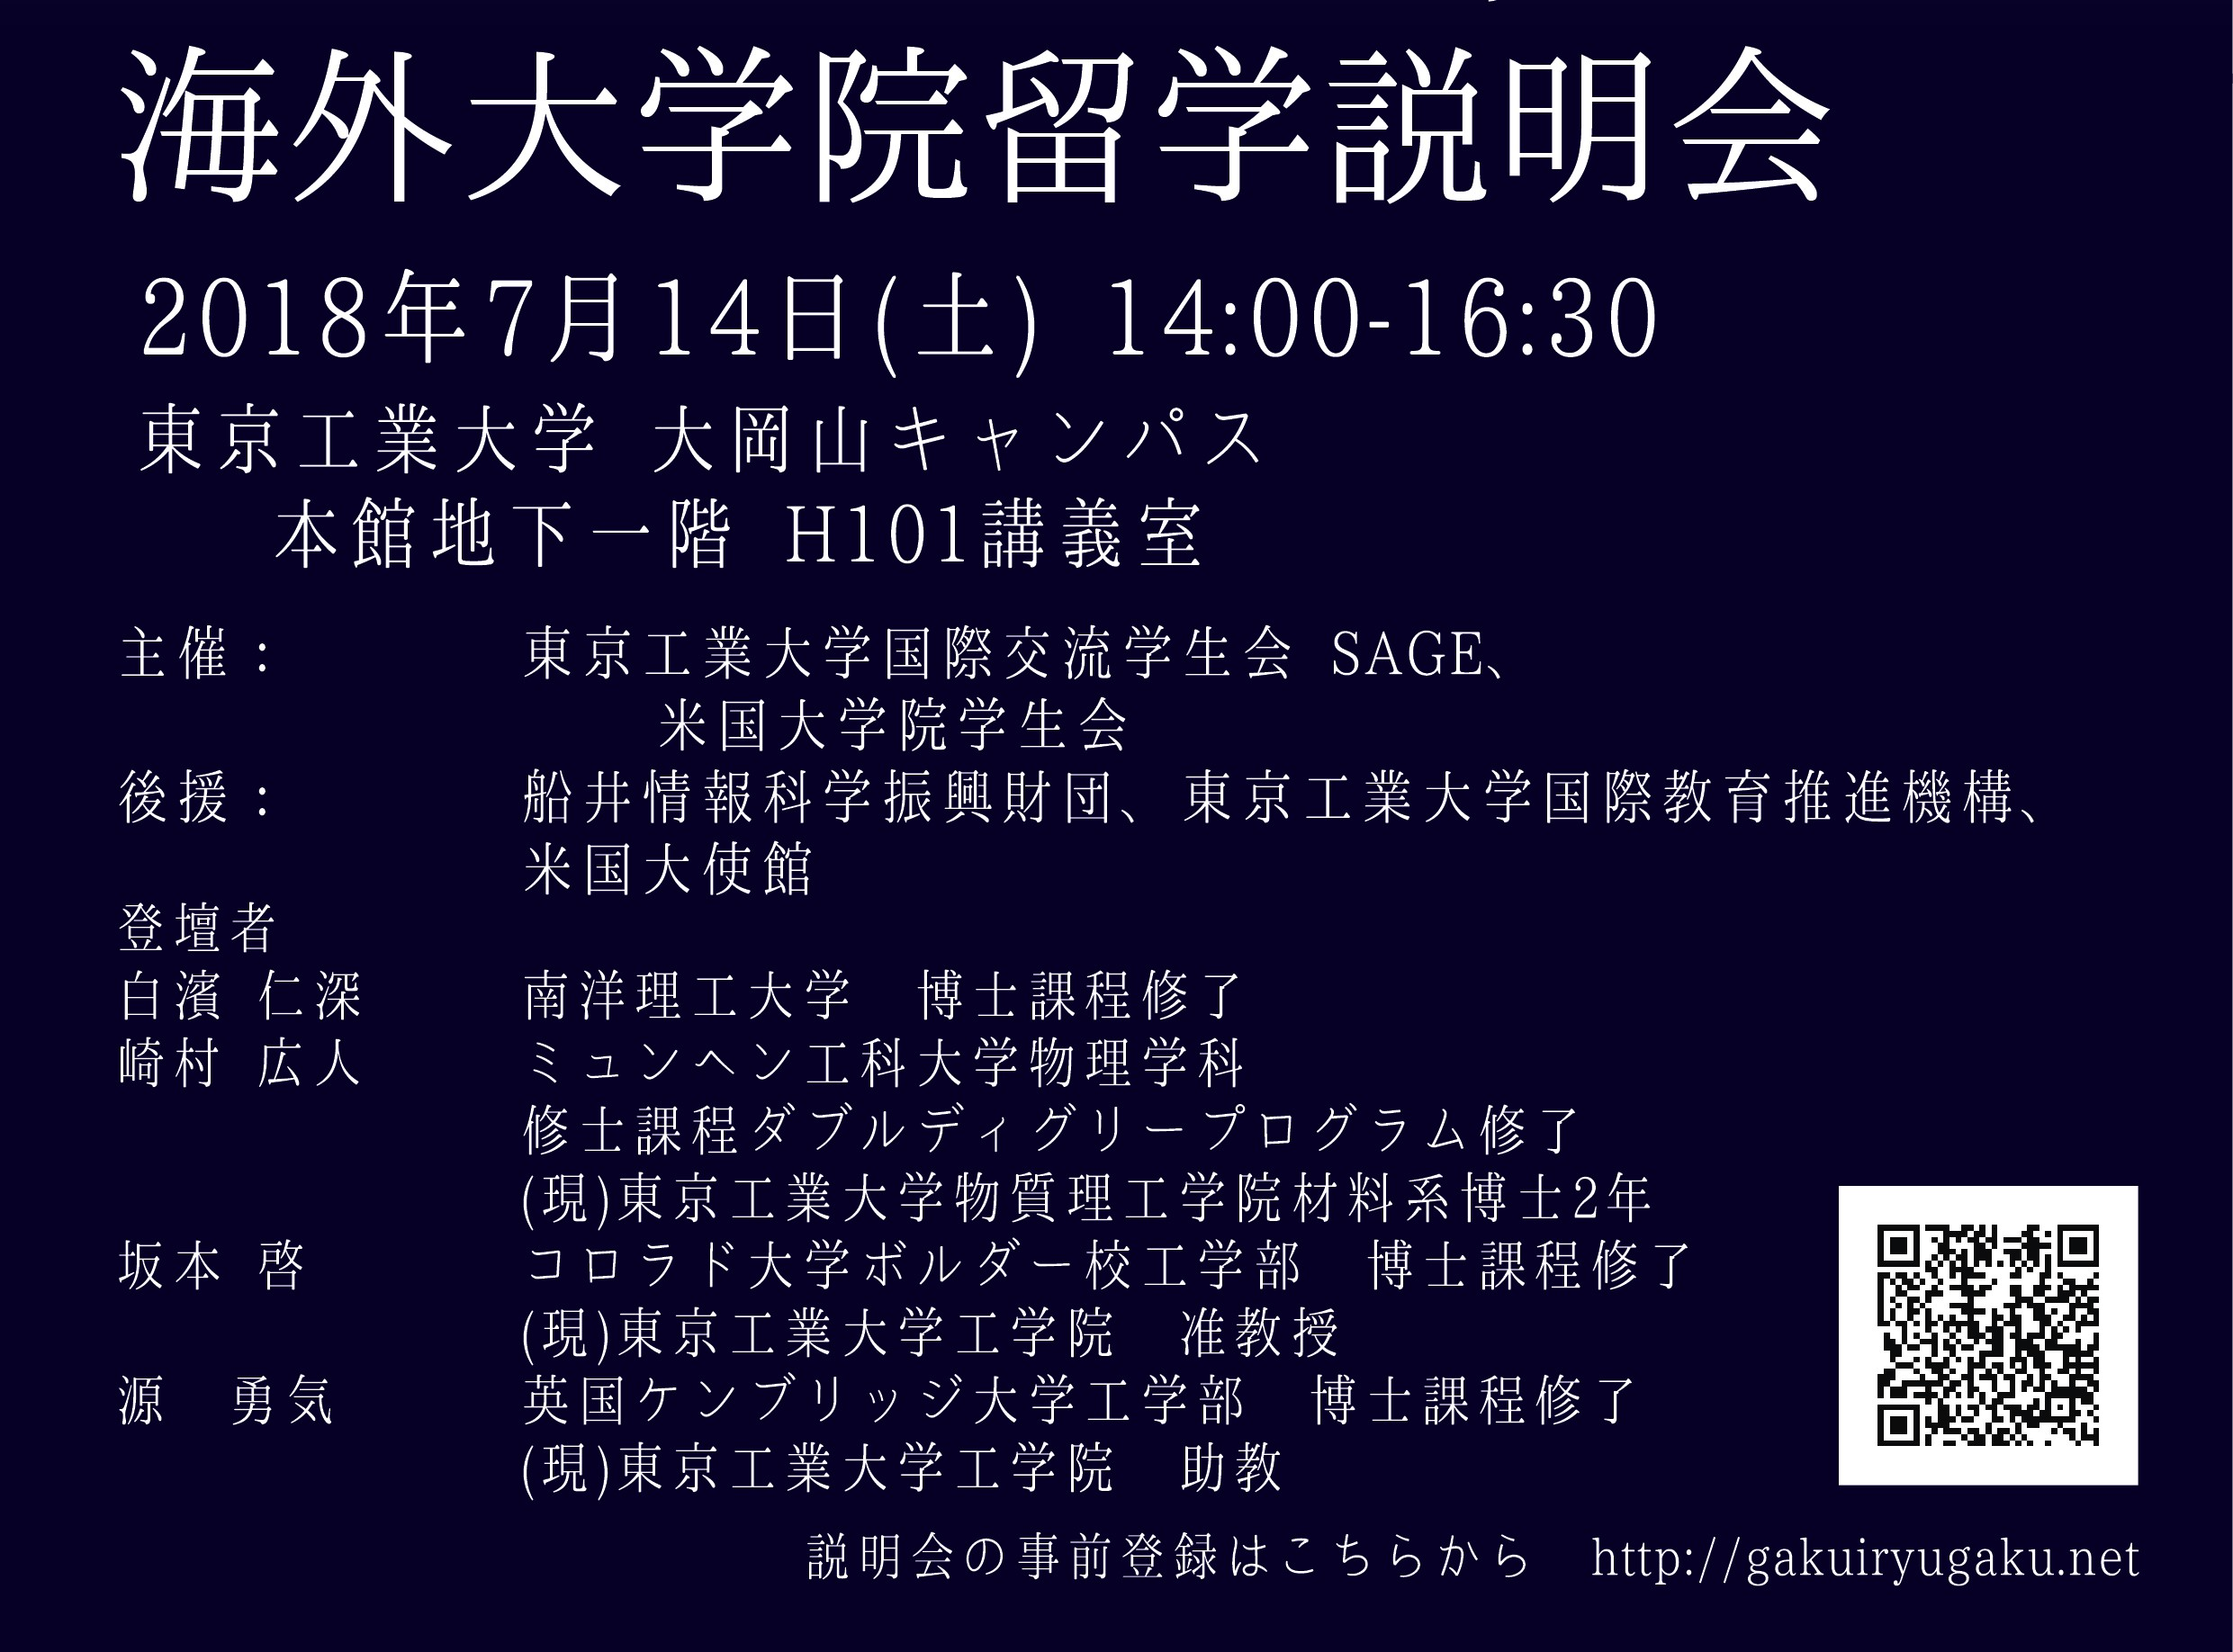 7/14(土)開催:海外大学院 留学説明会(米国大学院学生会とSAGEの共催イベント)